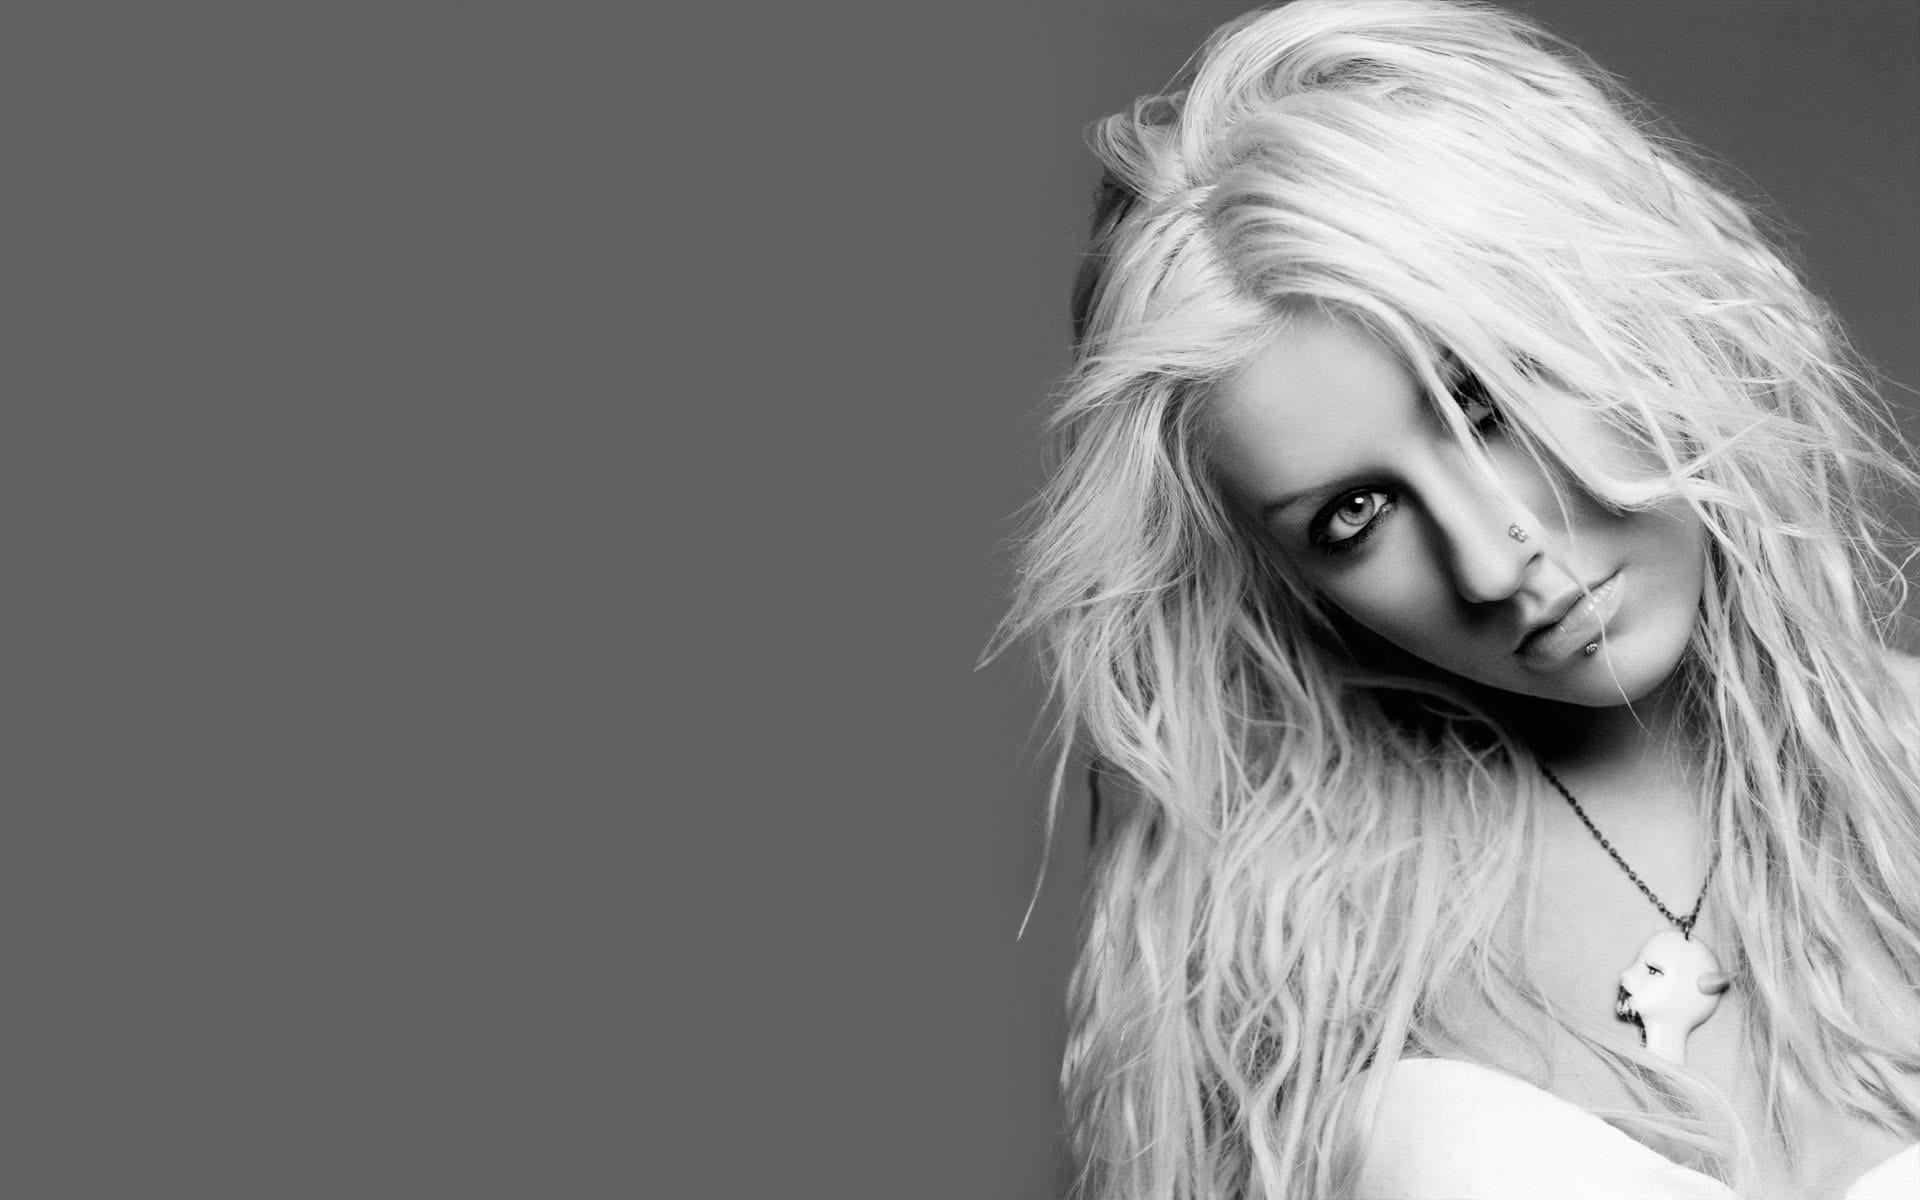 Christina Aguilera HQ wallpapers